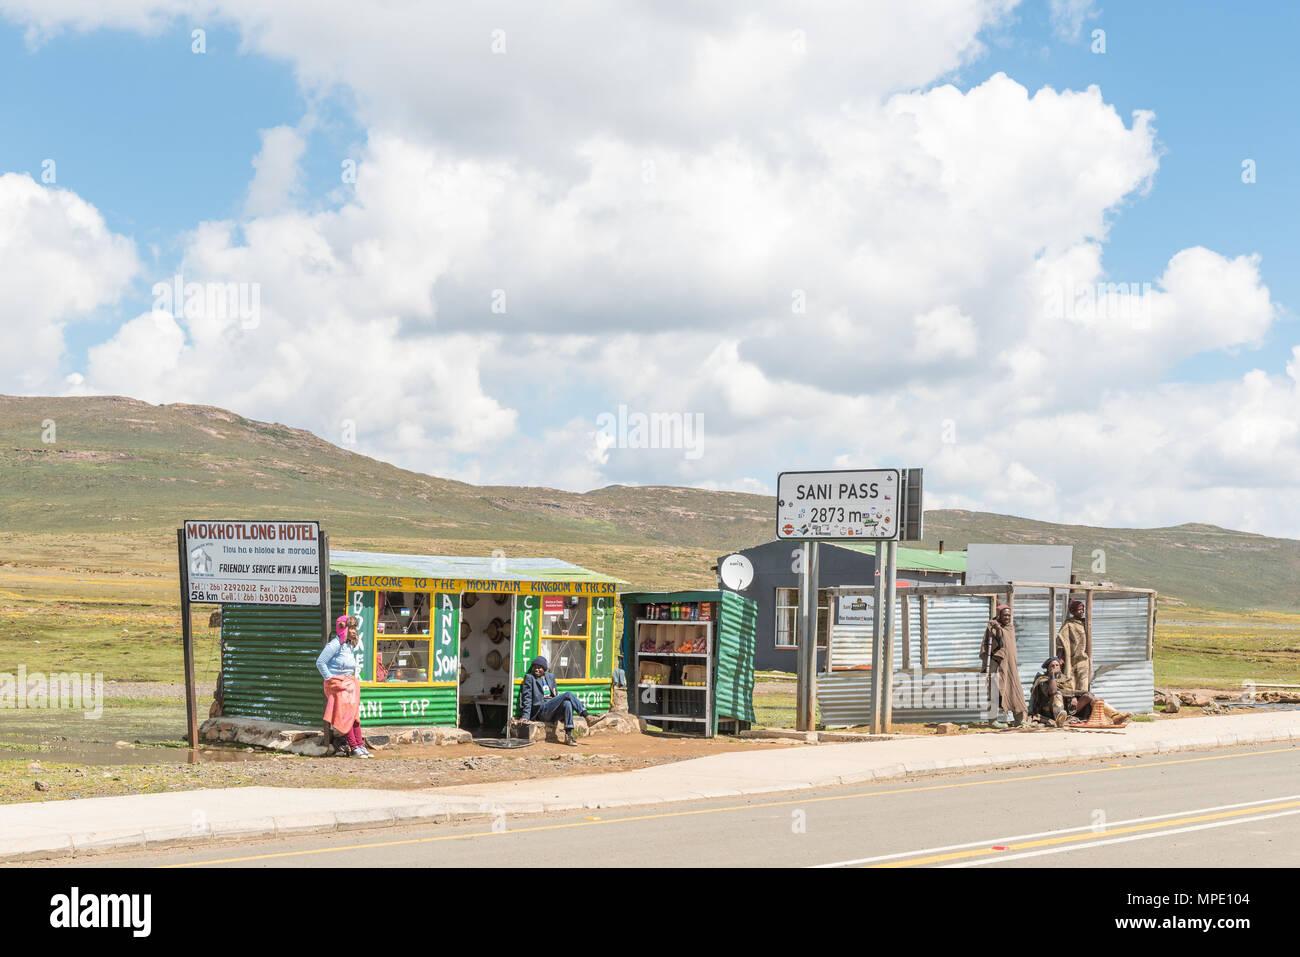 Basotho Women Stock Photos & Basotho Women Stock Images - Alamy